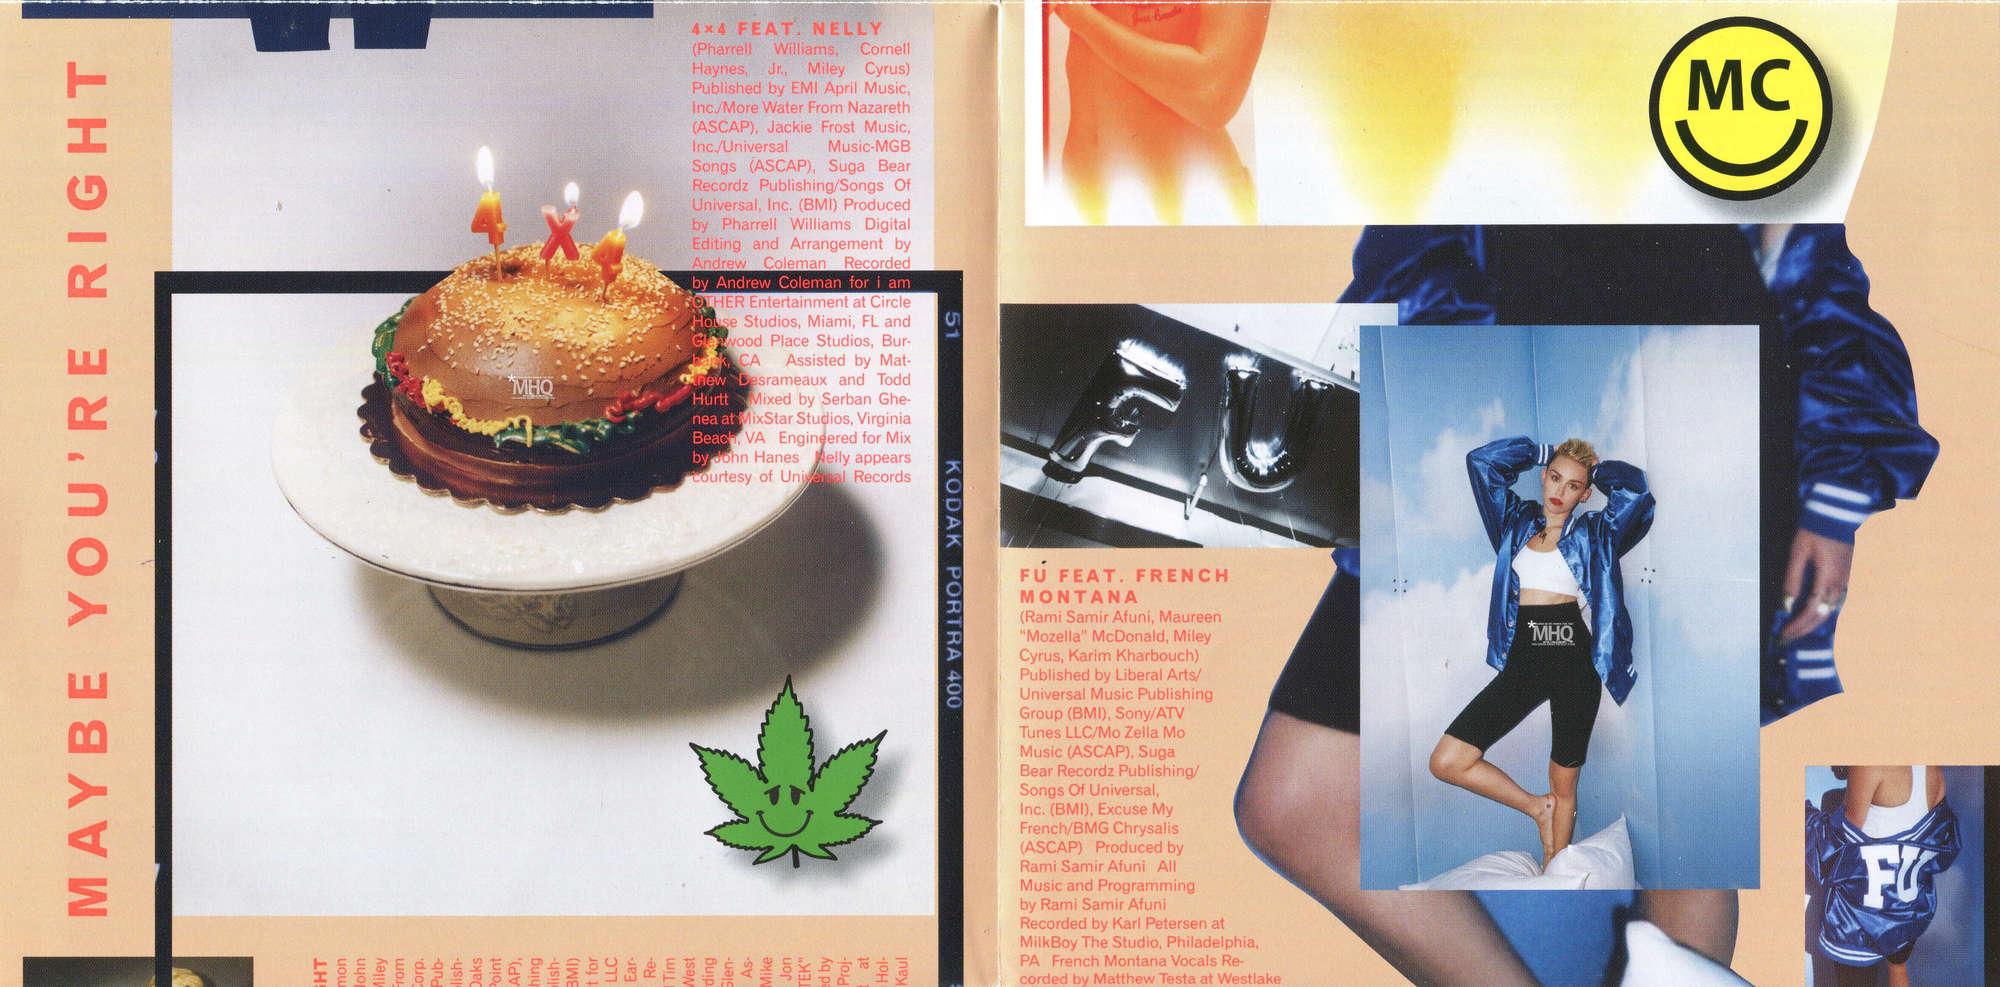 Miley Cyrus: Bangerz Album Booklet -03 - GotCeleb